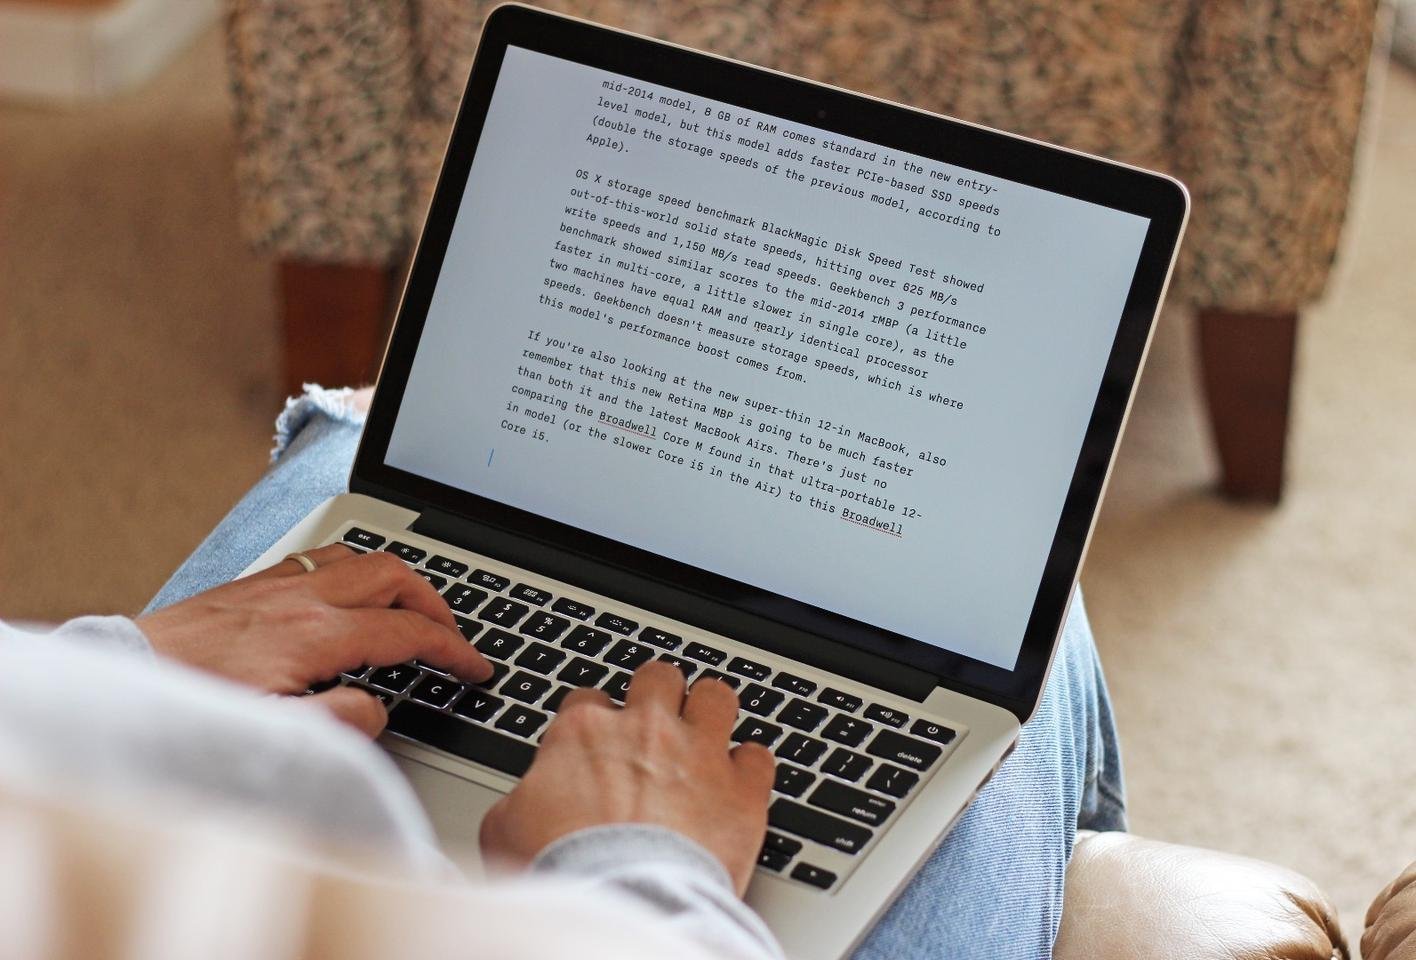 The 13-inch MacBook Pro with Retina Display